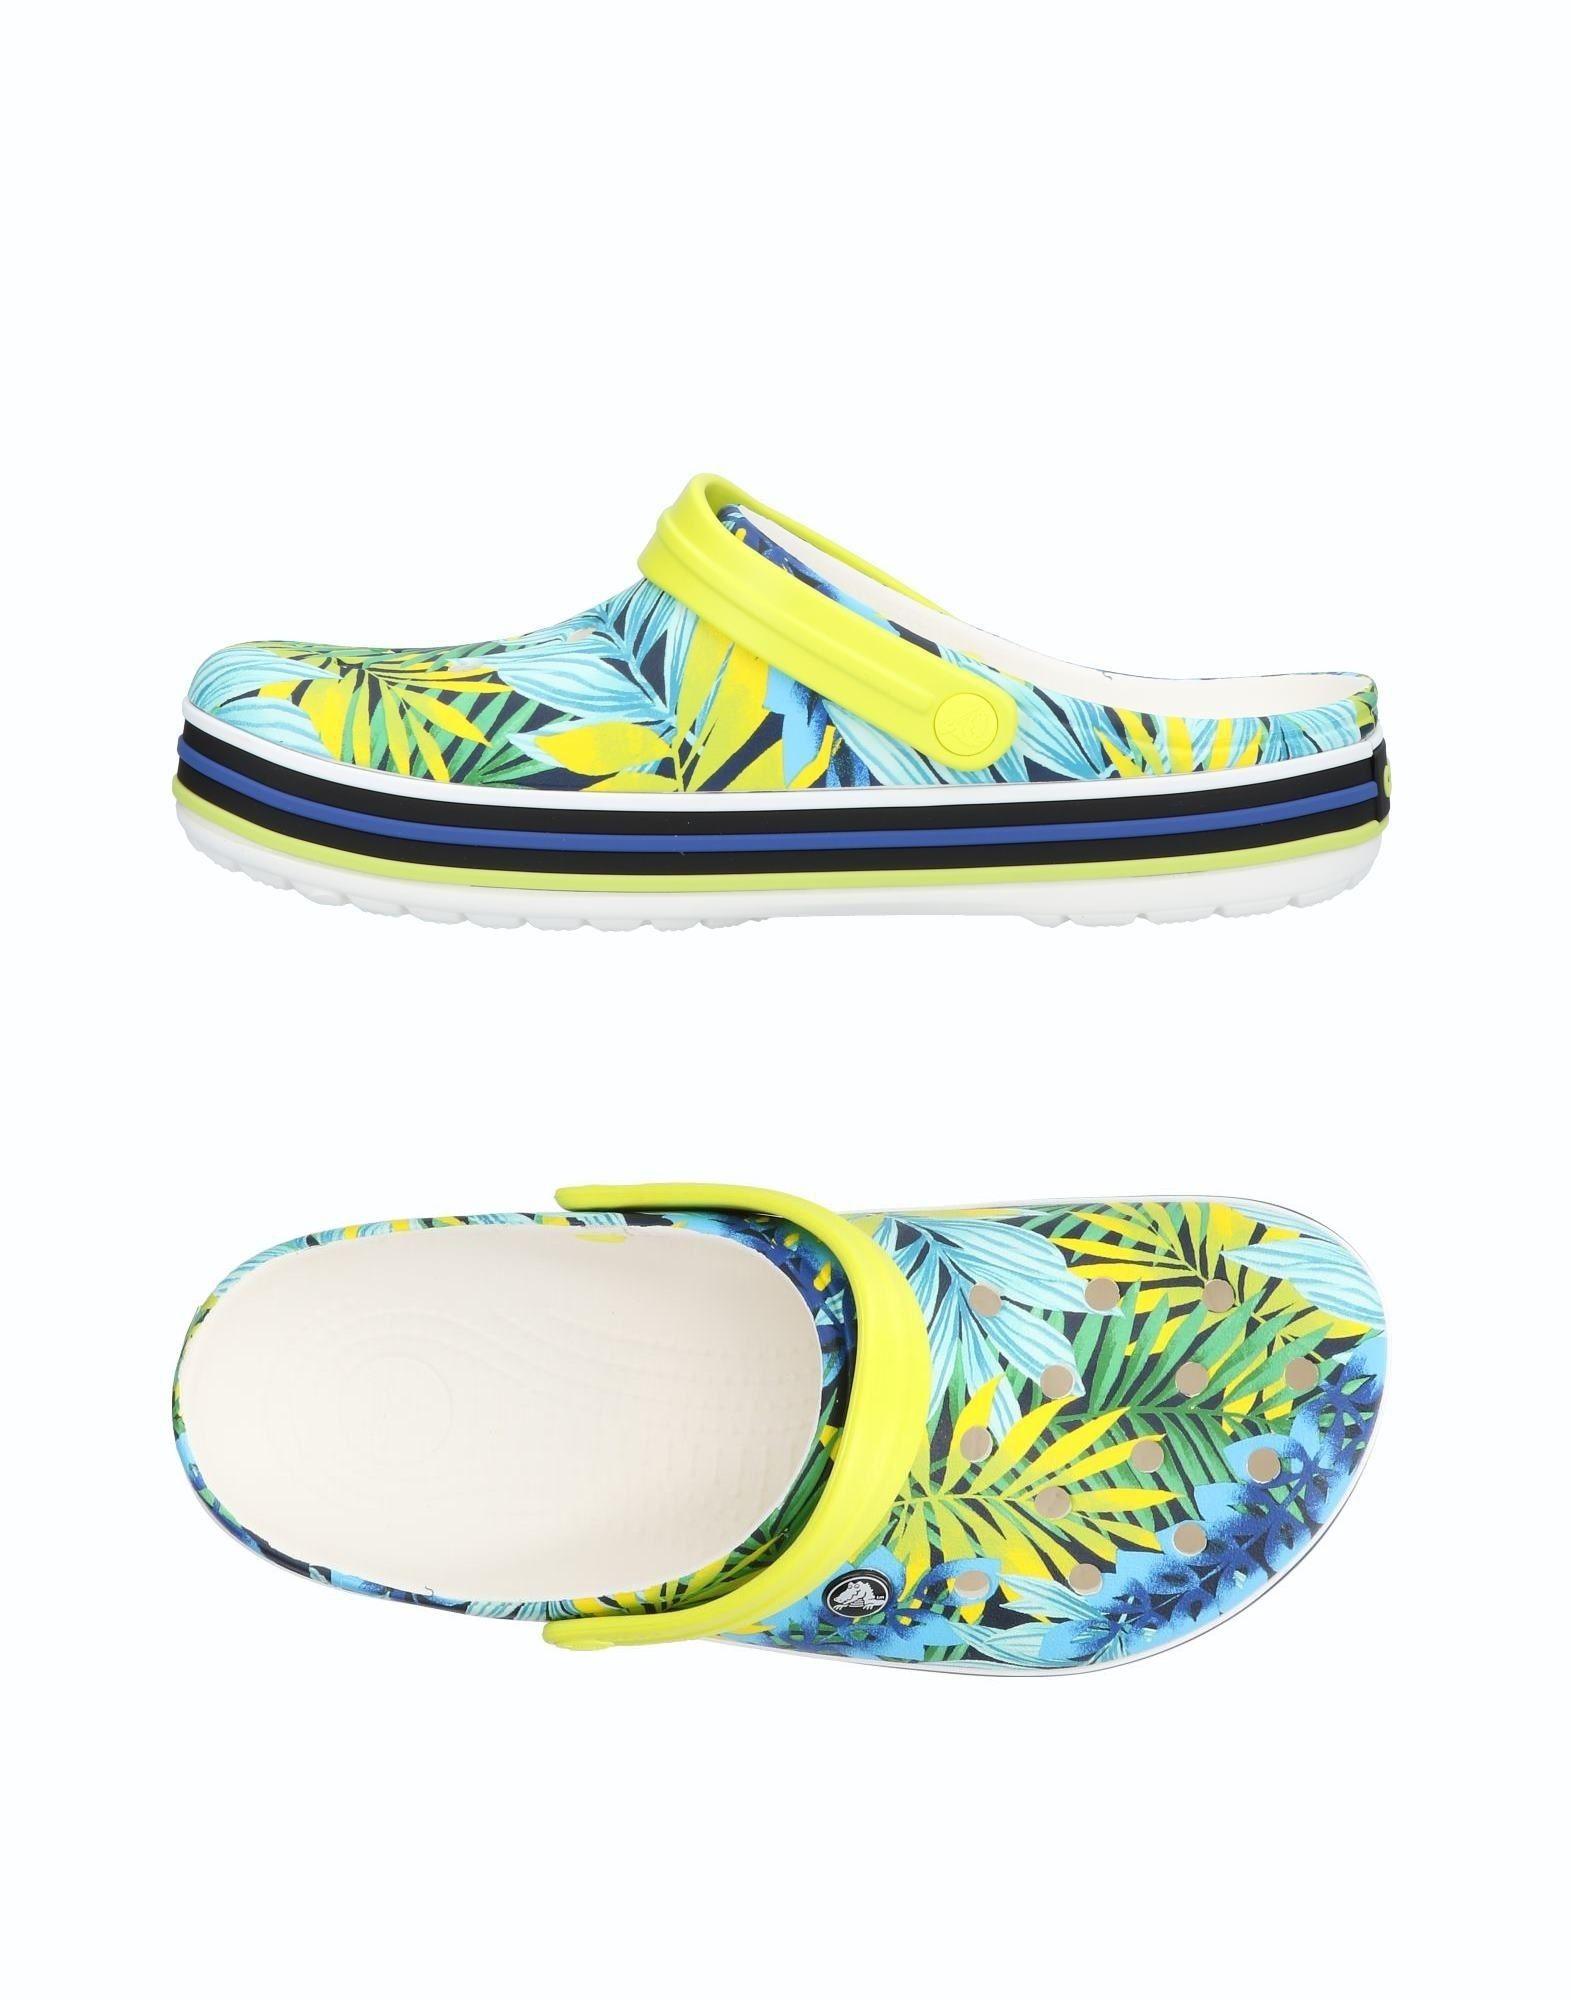 Moda Uomo Sandali Crocs Uomo Moda - 11463658VQ 911682